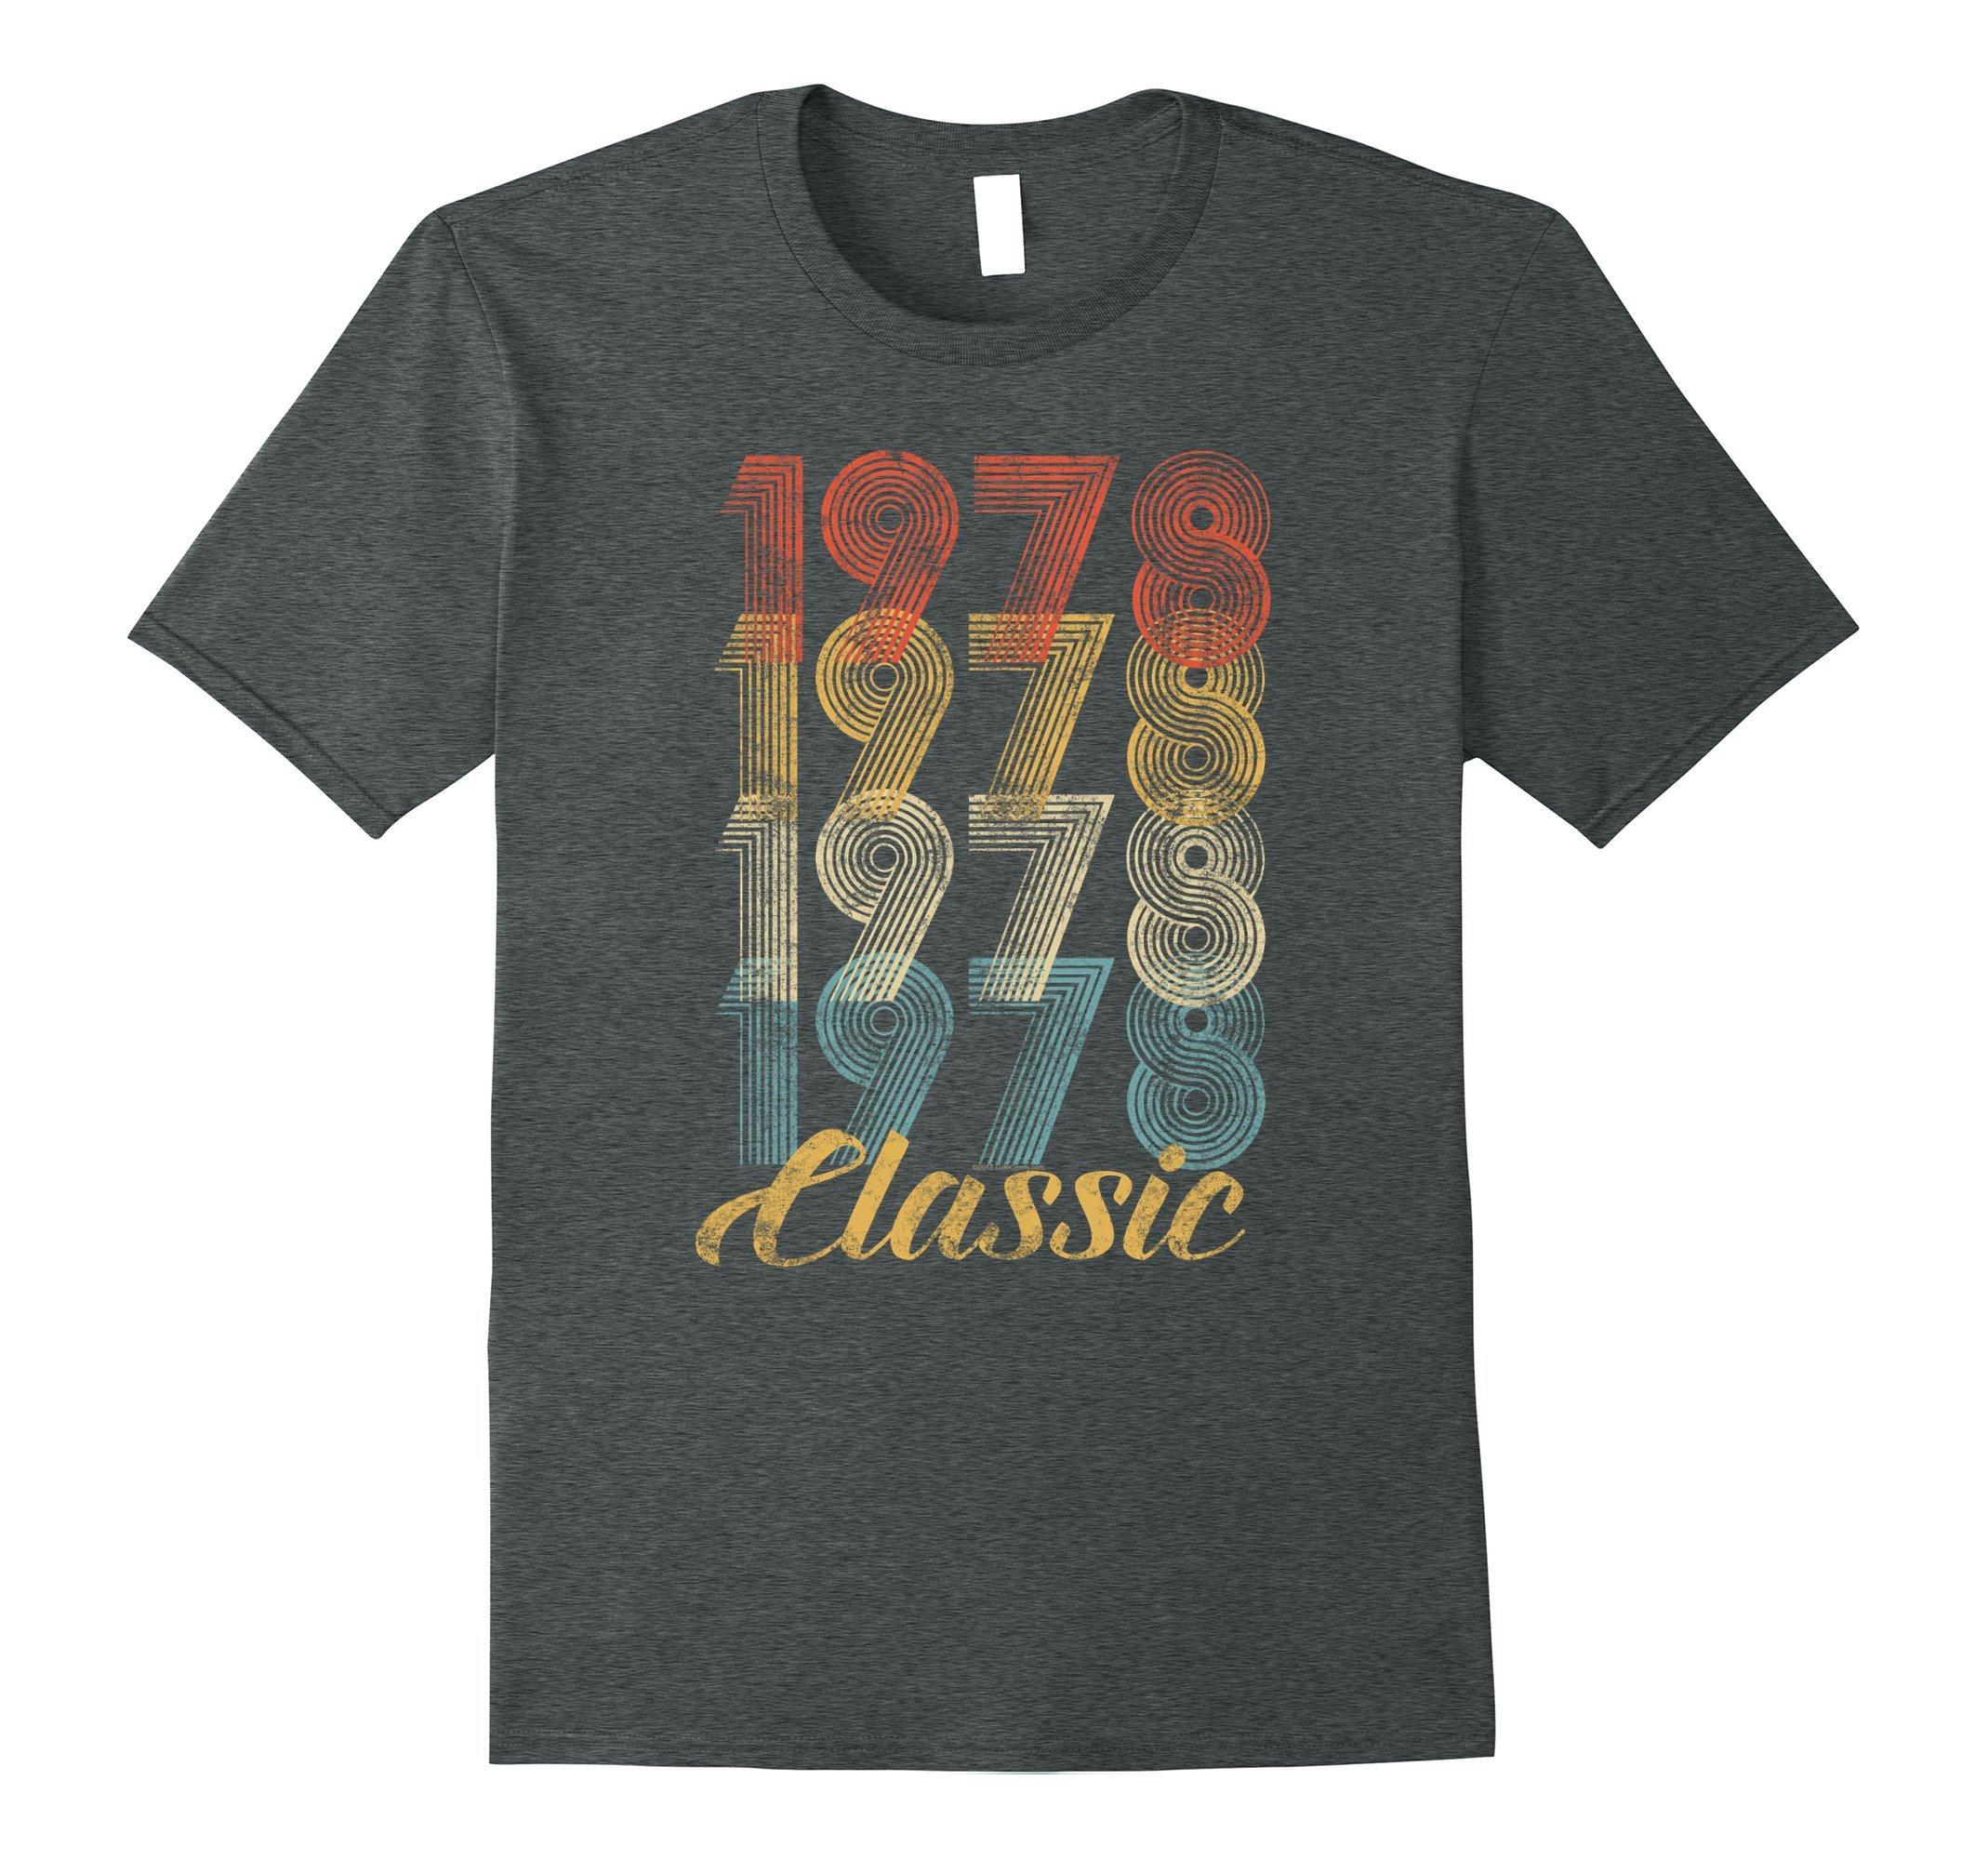 Mens CuteComfy 40th Birthday Gift Vintage 1978 T-Shirt Men Women Large Dark Heather